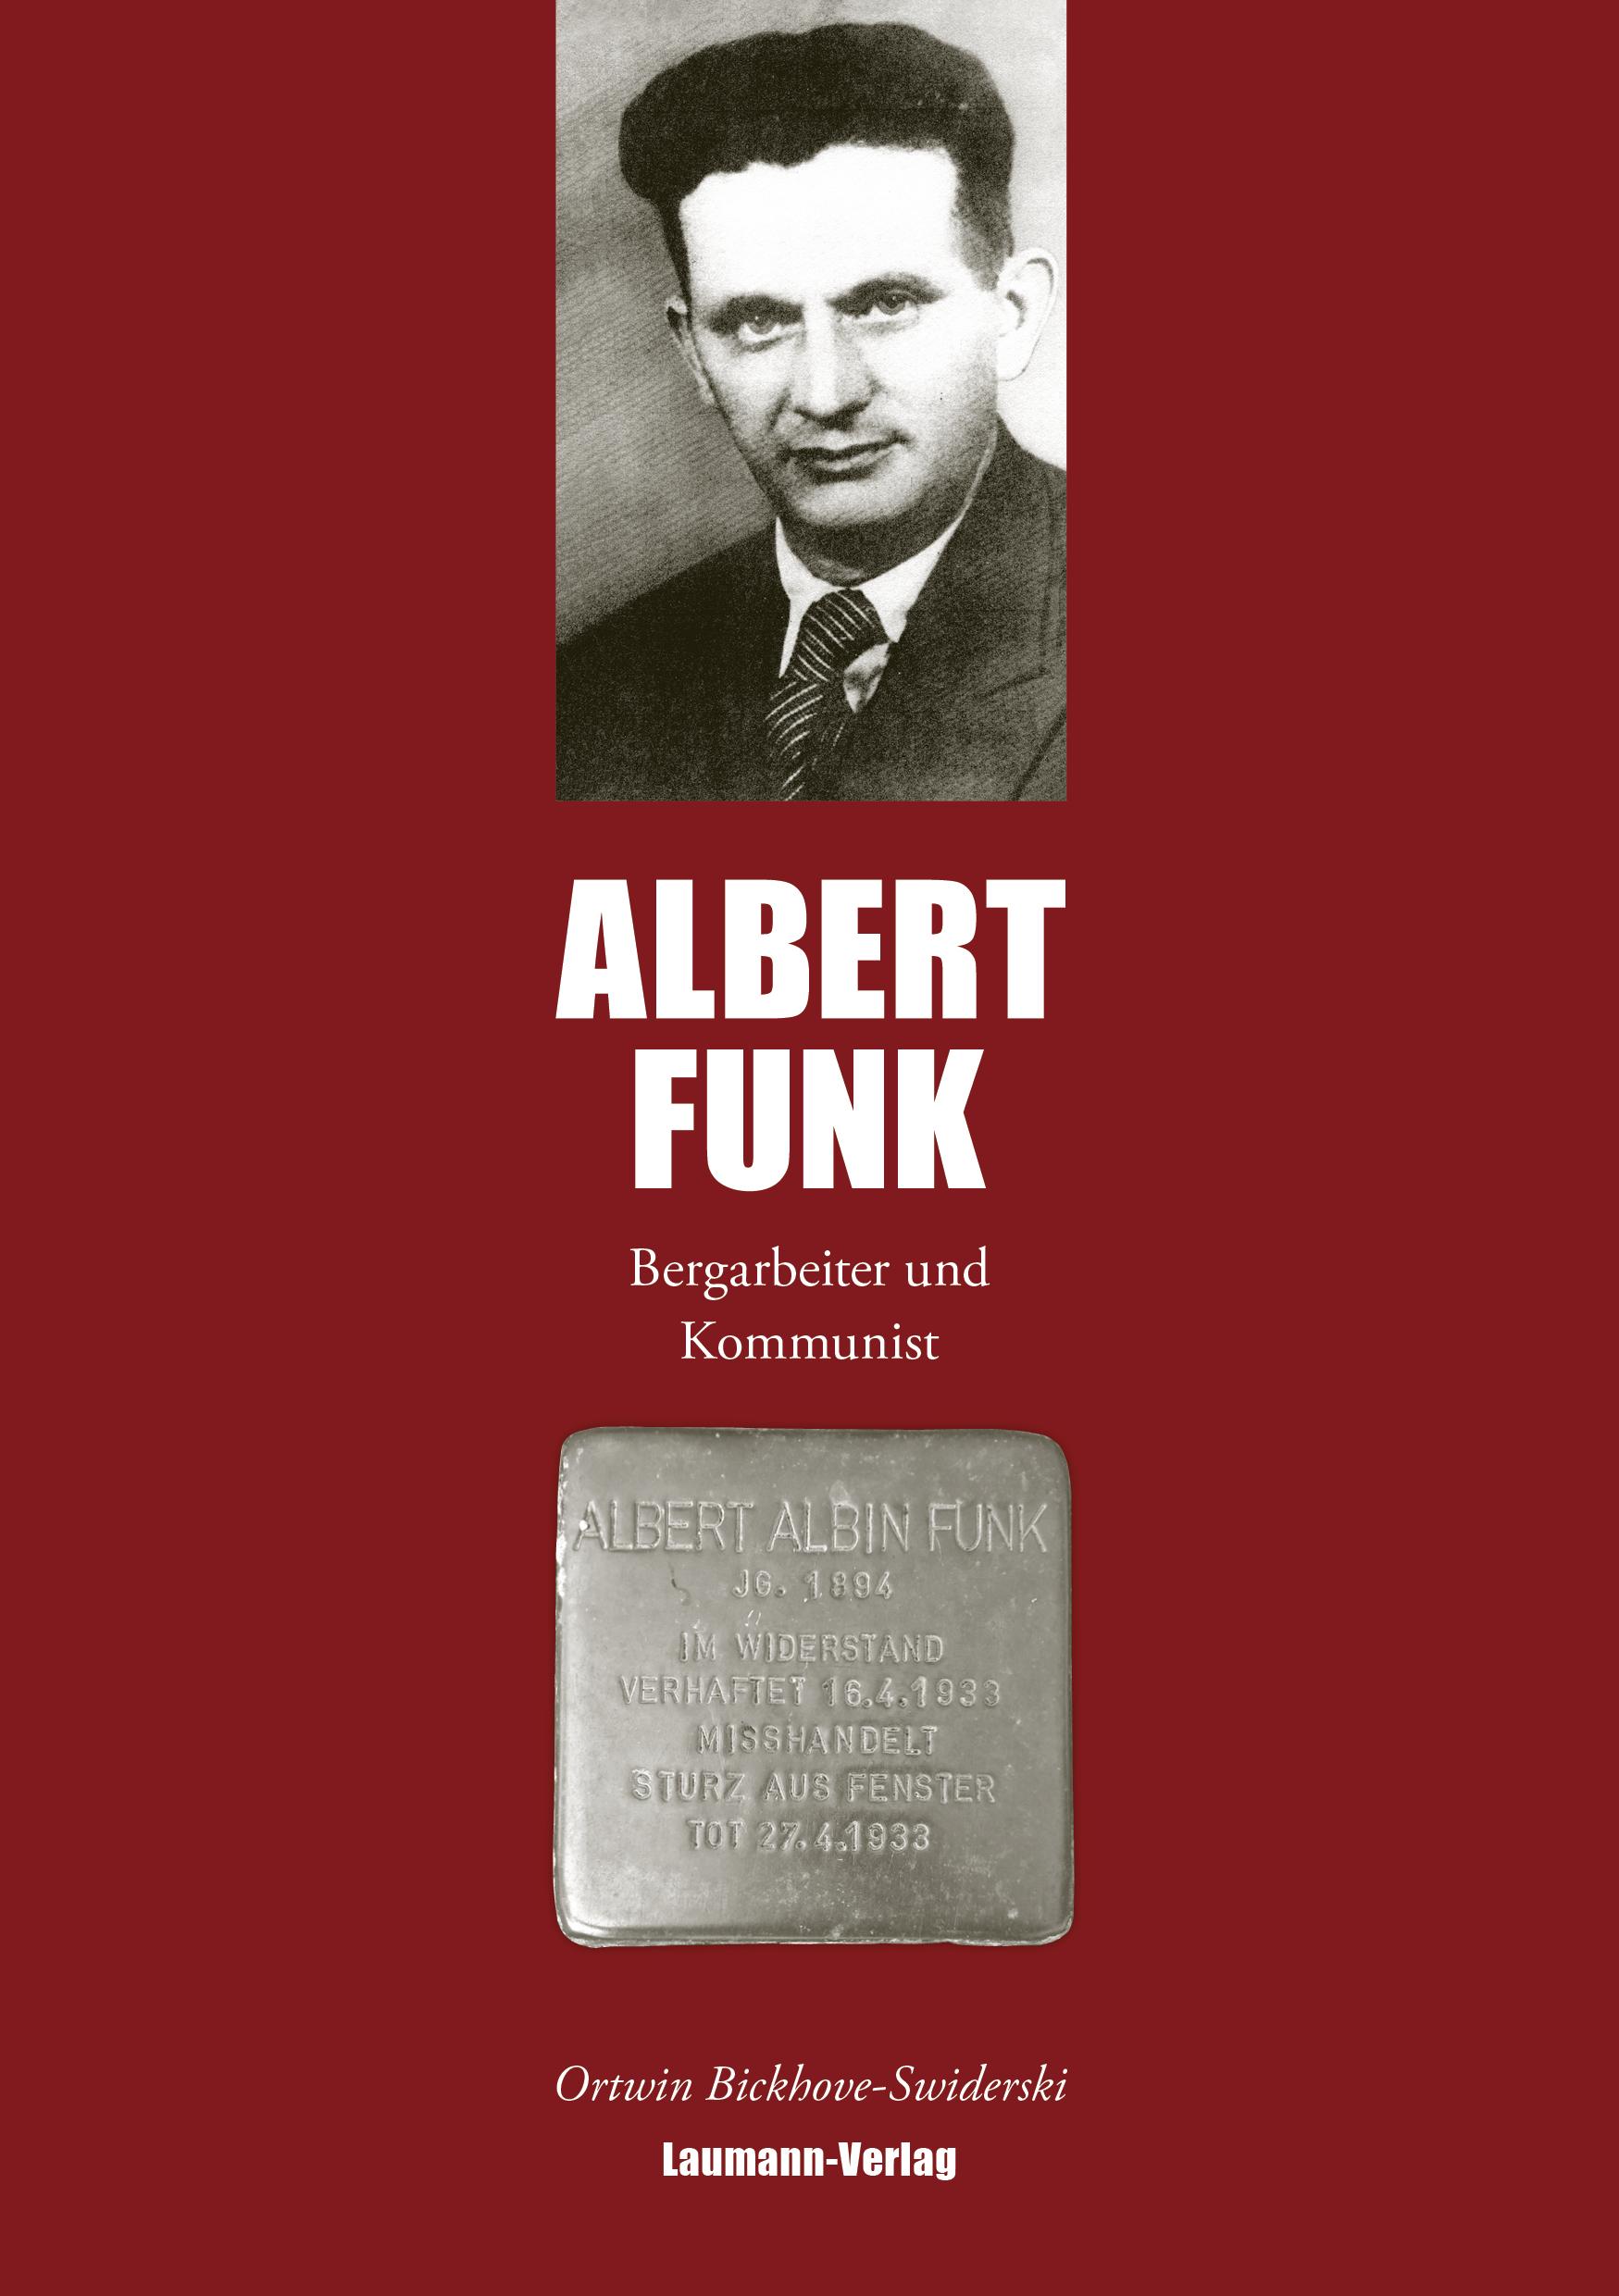 NEU Albert Funk Ortwin Bickhove-Swiderski 604641